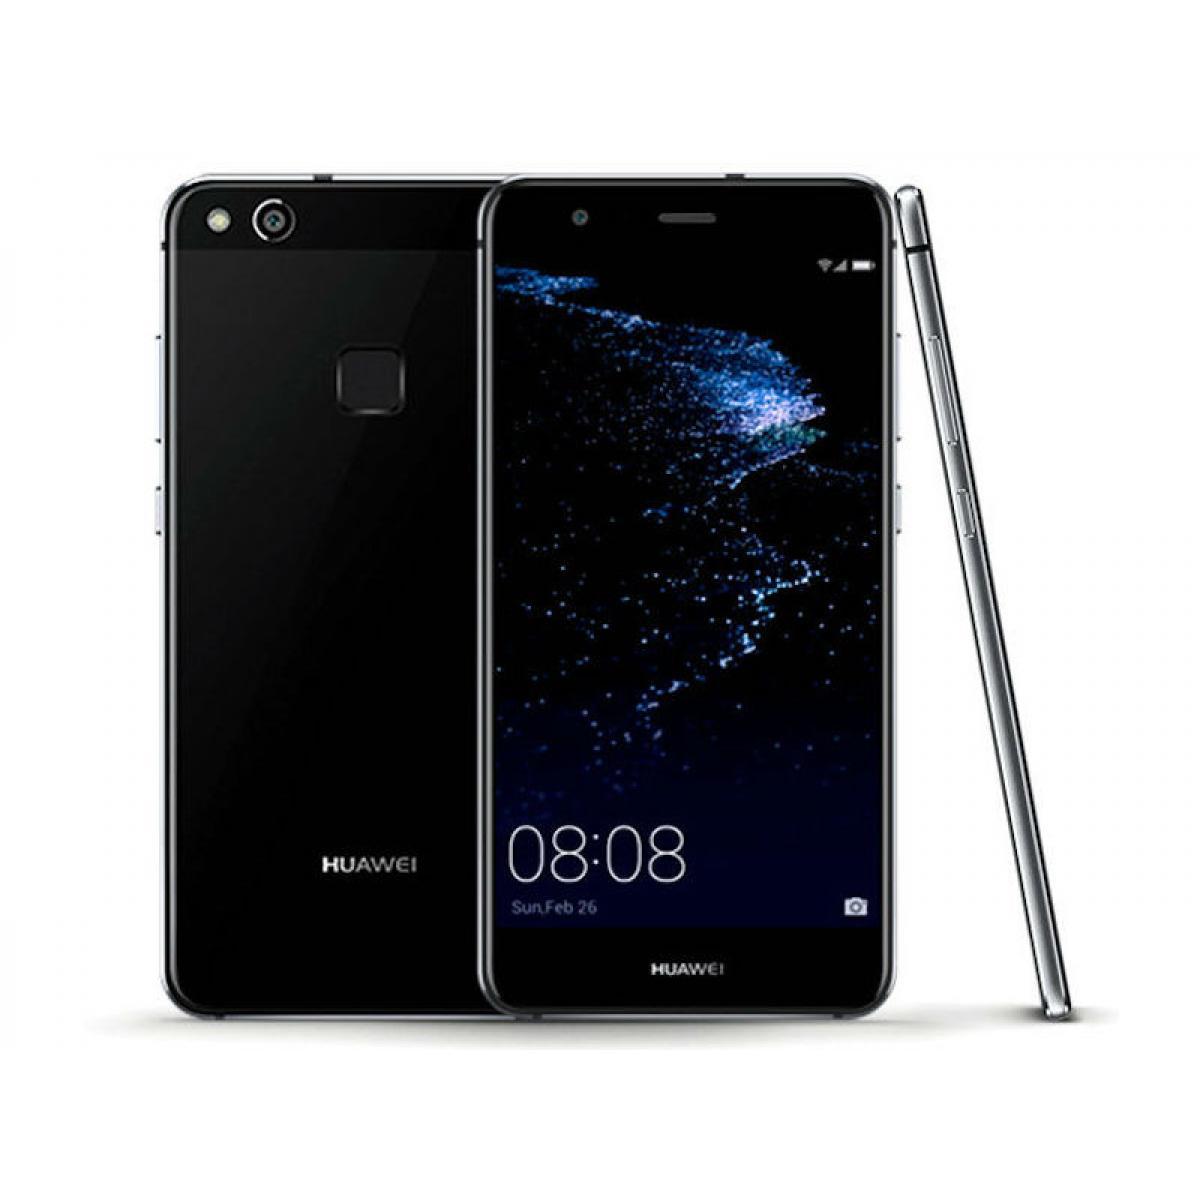 Huawei P10 Lite Gts Amman Jordan